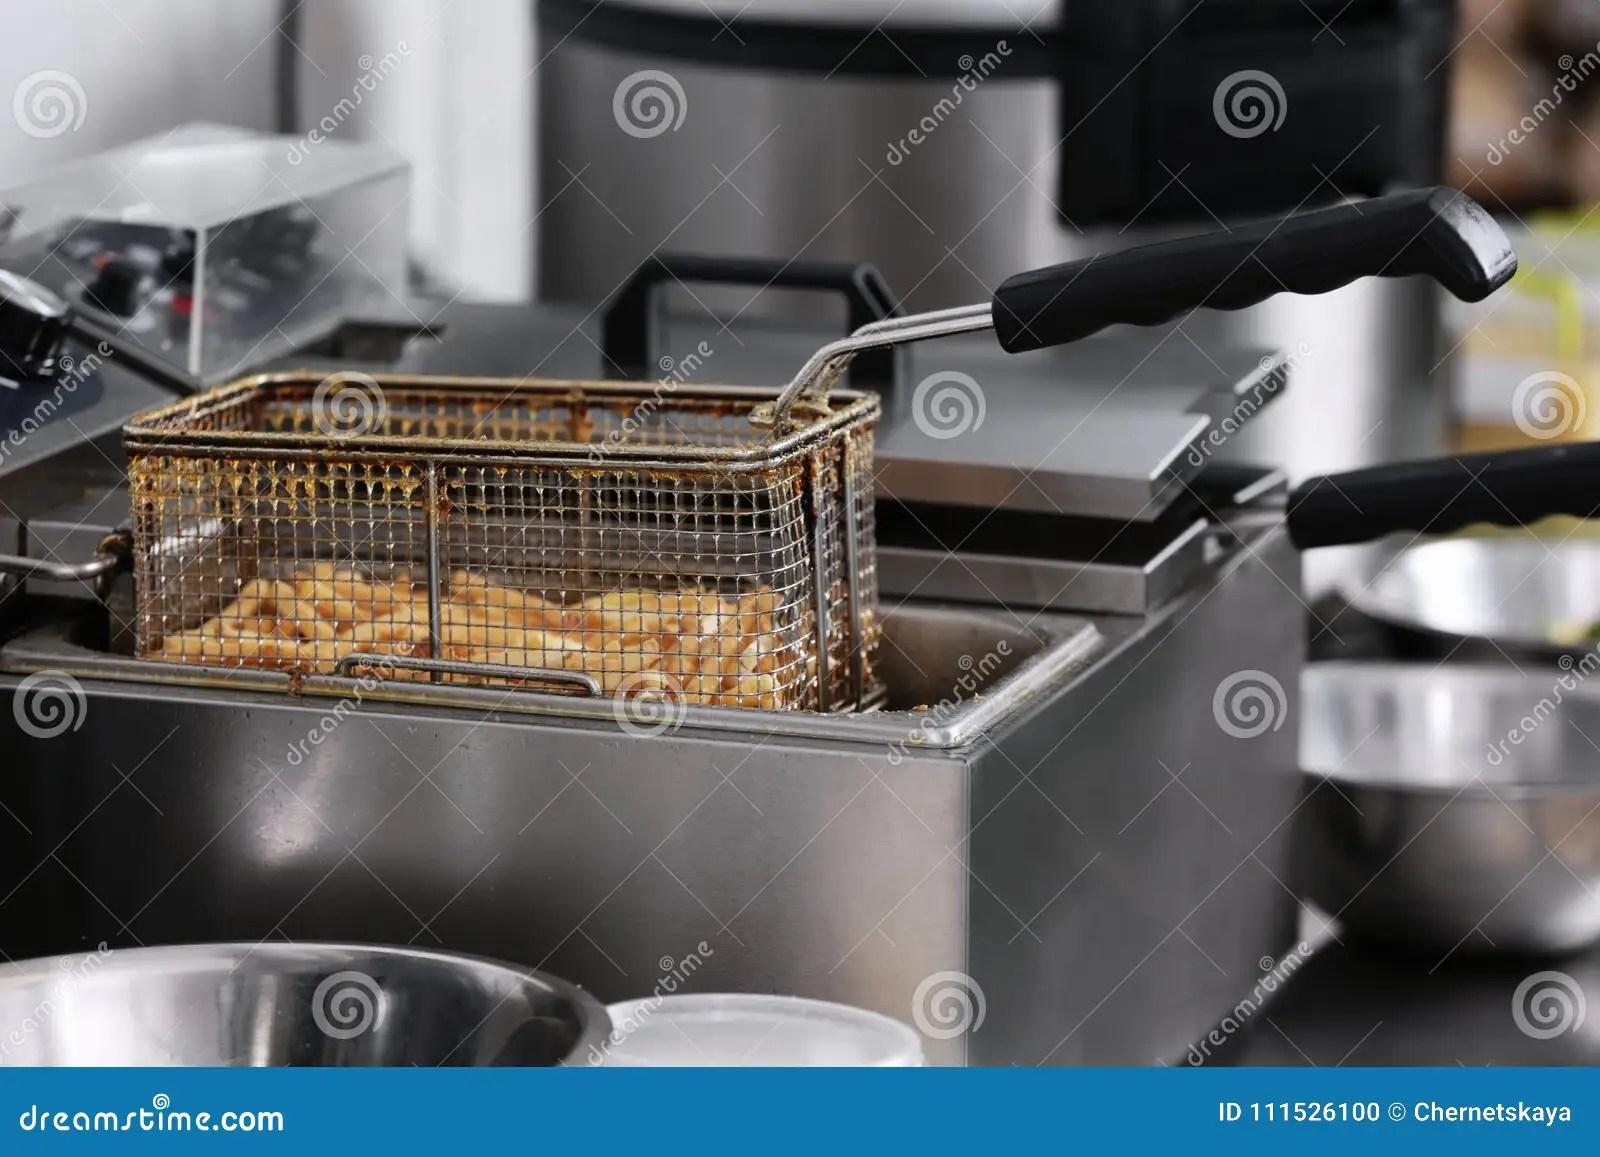 kitchen fryer small table plans 在深炸锅的炸薯条在厨房库存照片 图片包括有主厨 新鲜 厨师 健康 炸 在深炸锅的炸薯条在厨房